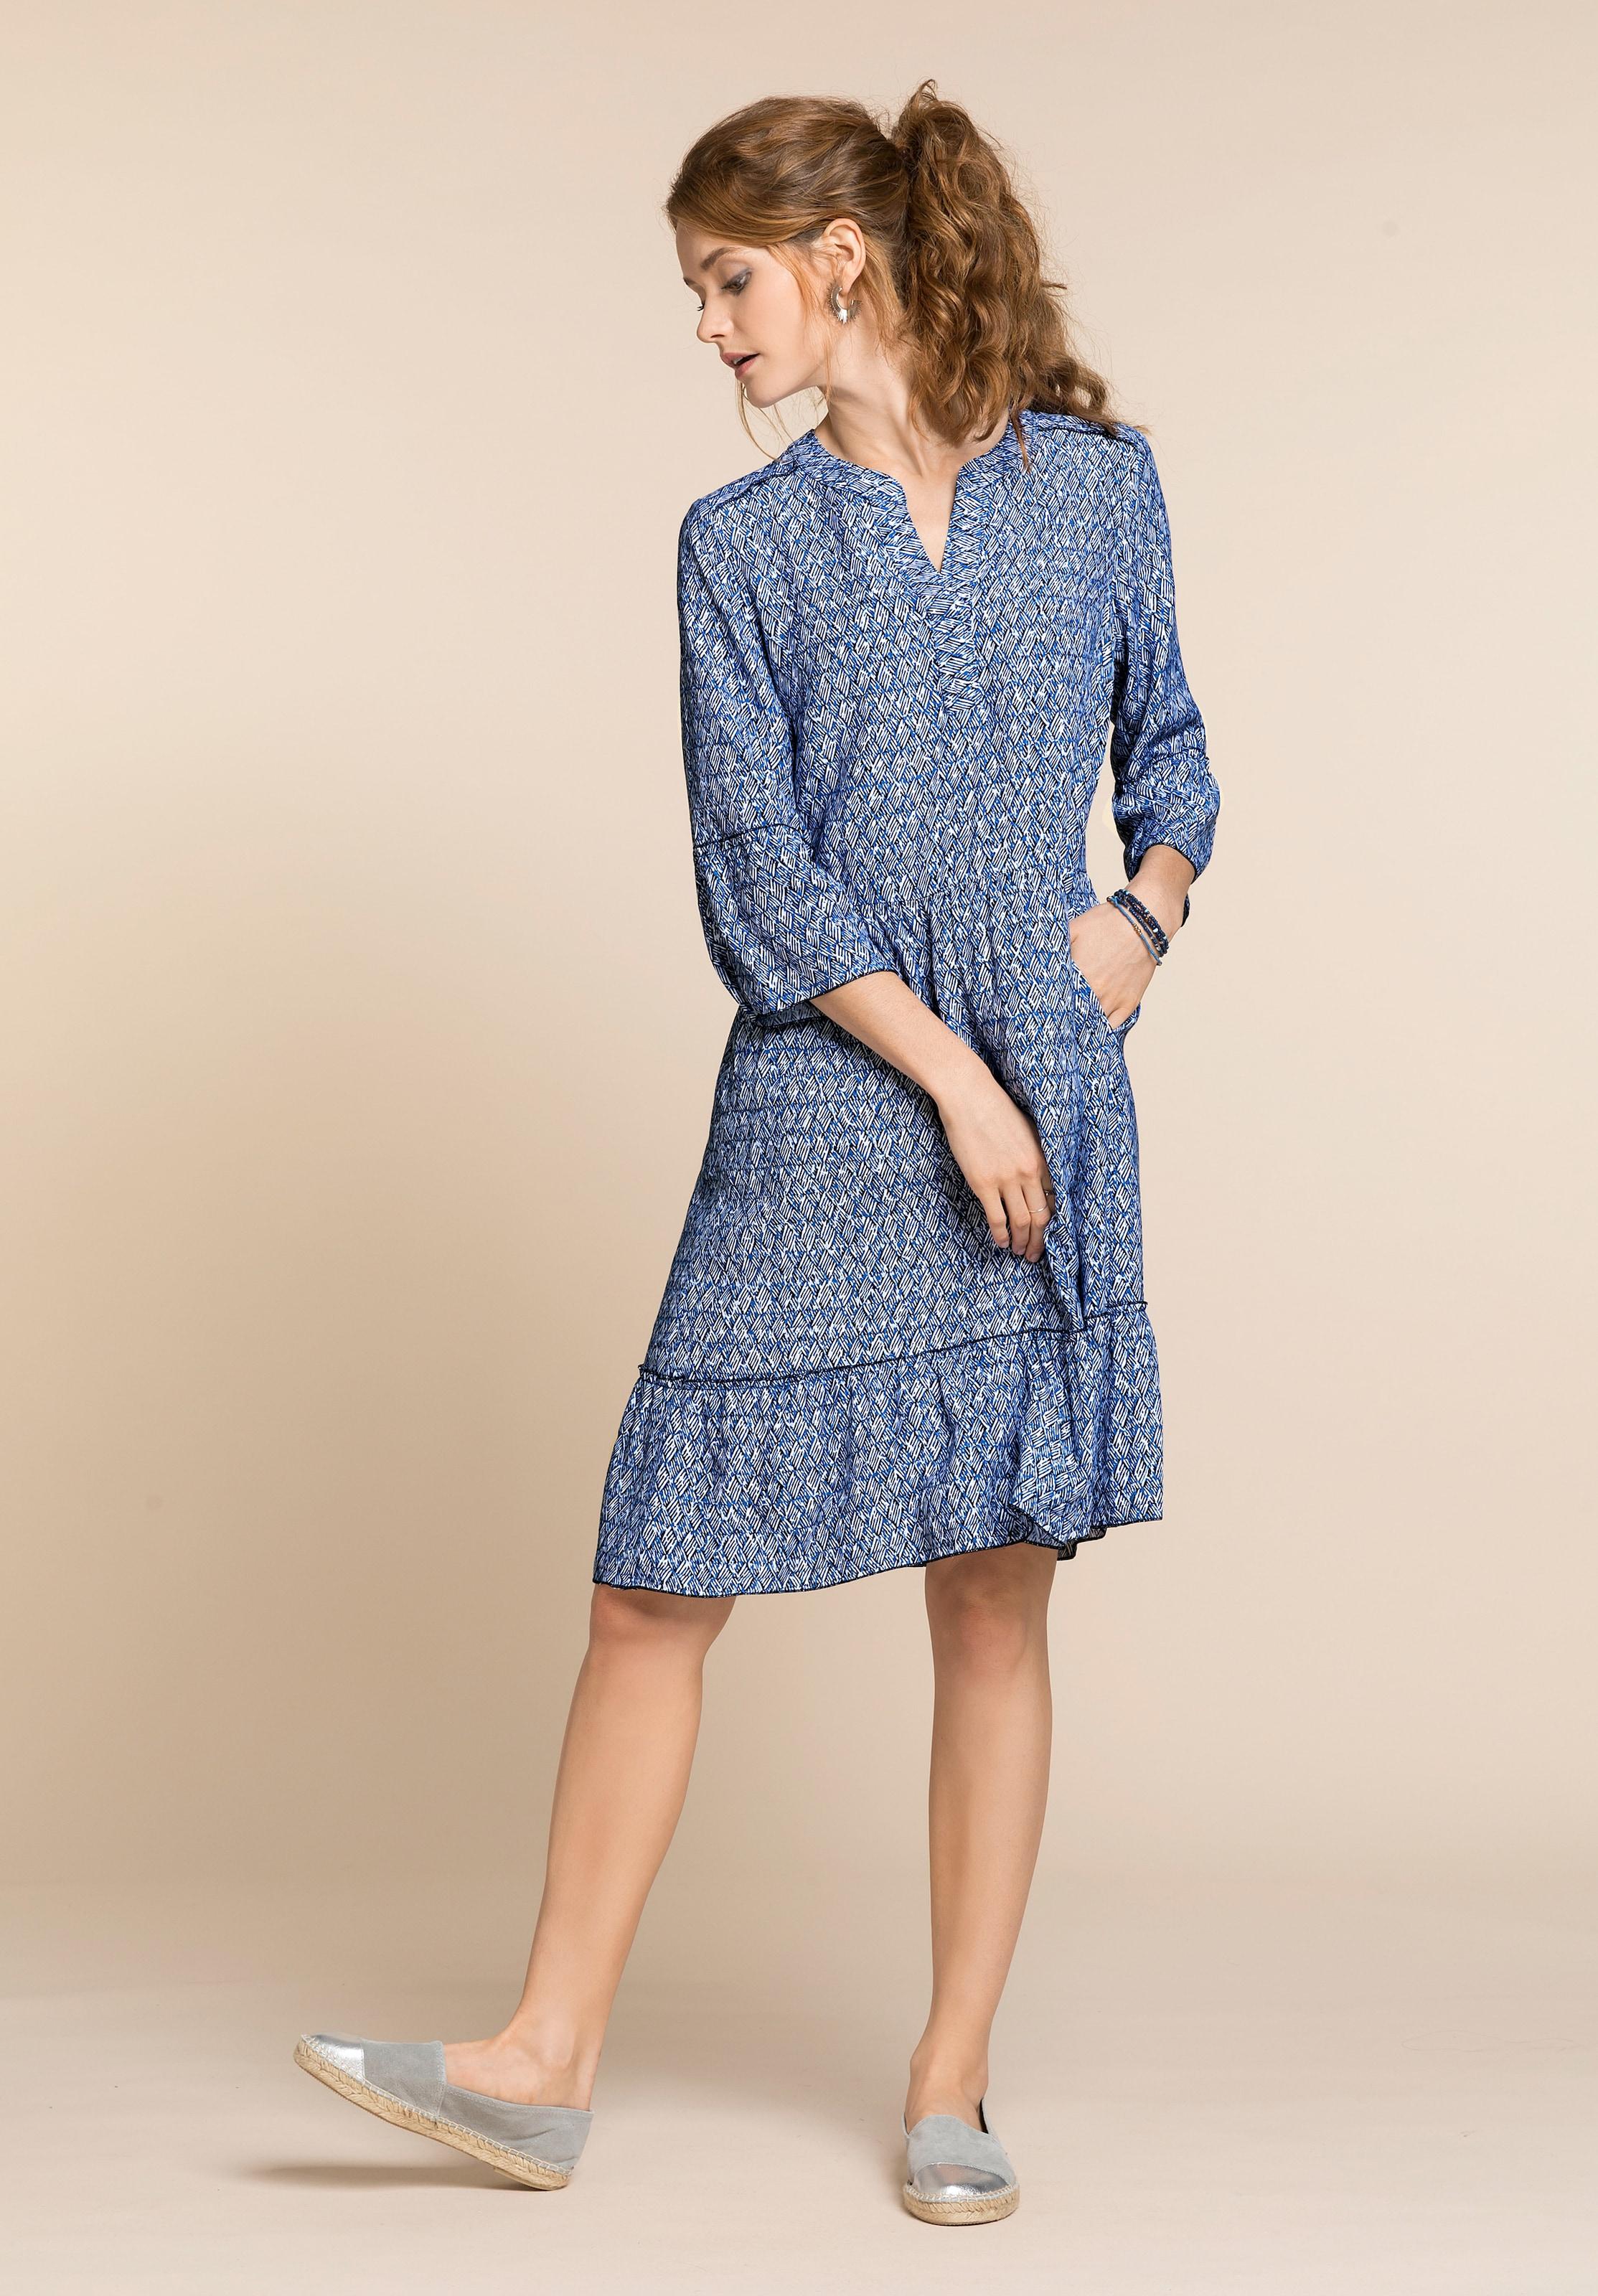 bianca druckkleid dany sommerliches Kleid im Minimal Design AKLBB1166460987